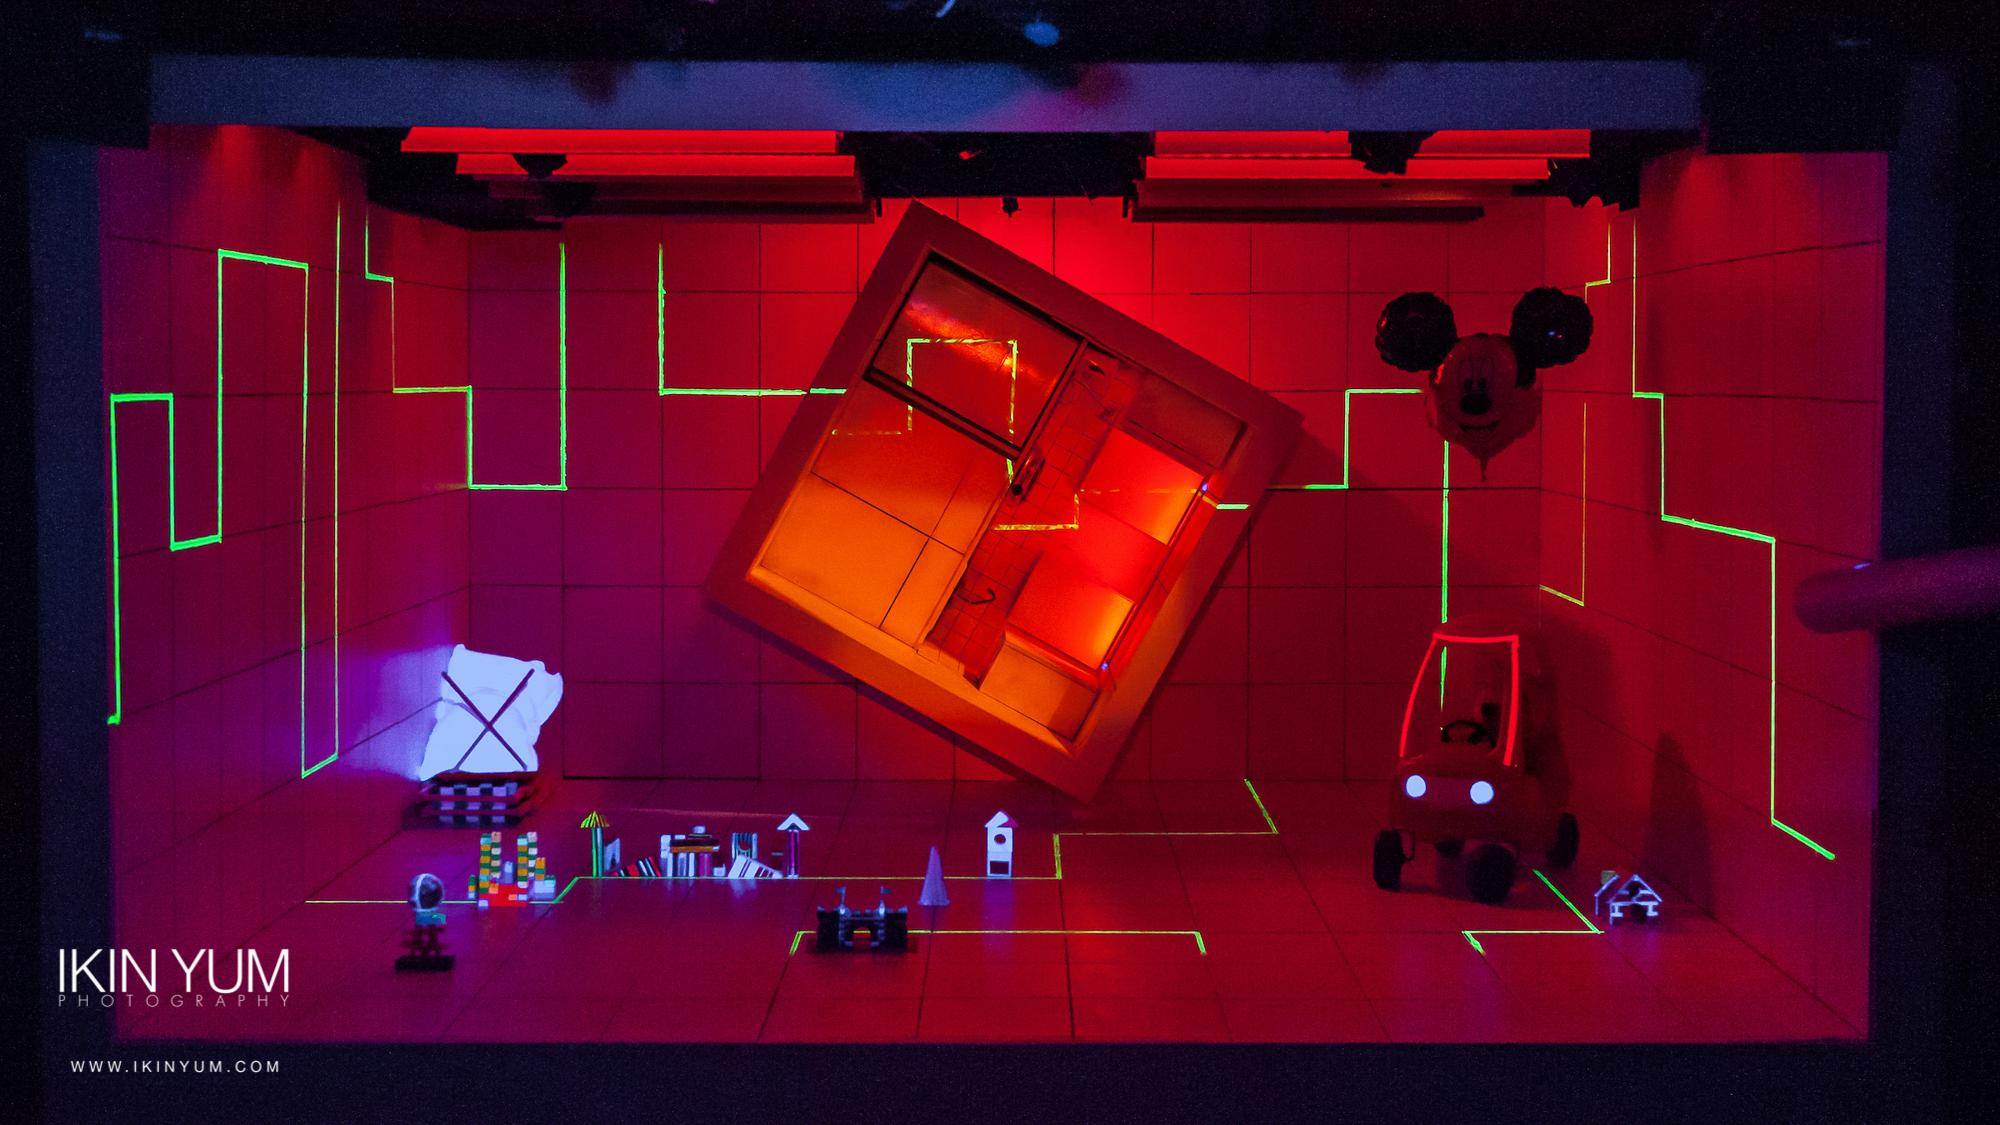 Goya - Gate theatre - Ikin Yum Photography-077.jpg